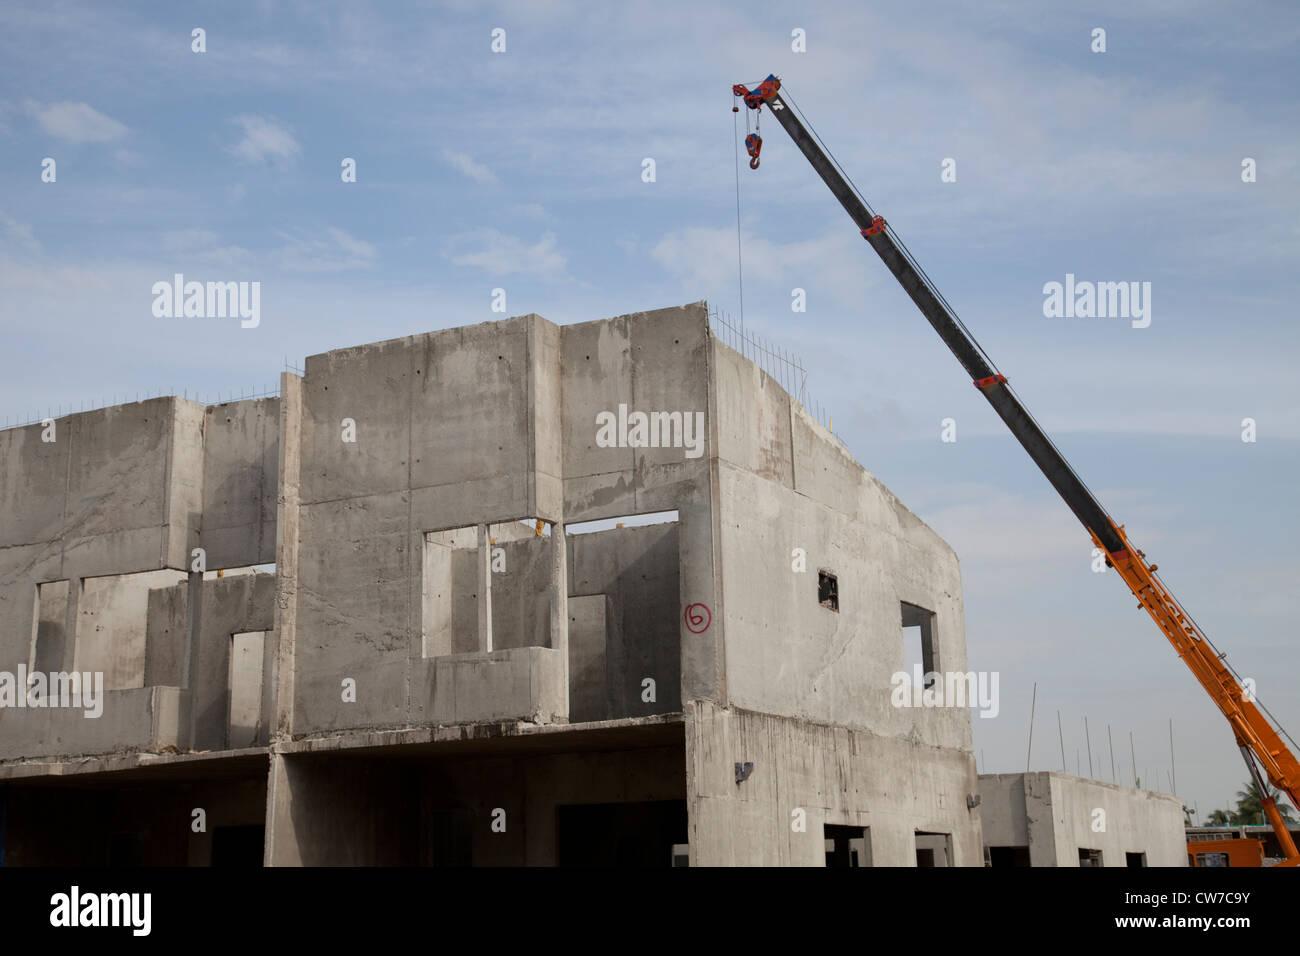 Häuserbau Bochum lift stockfotos lift bilder alamy